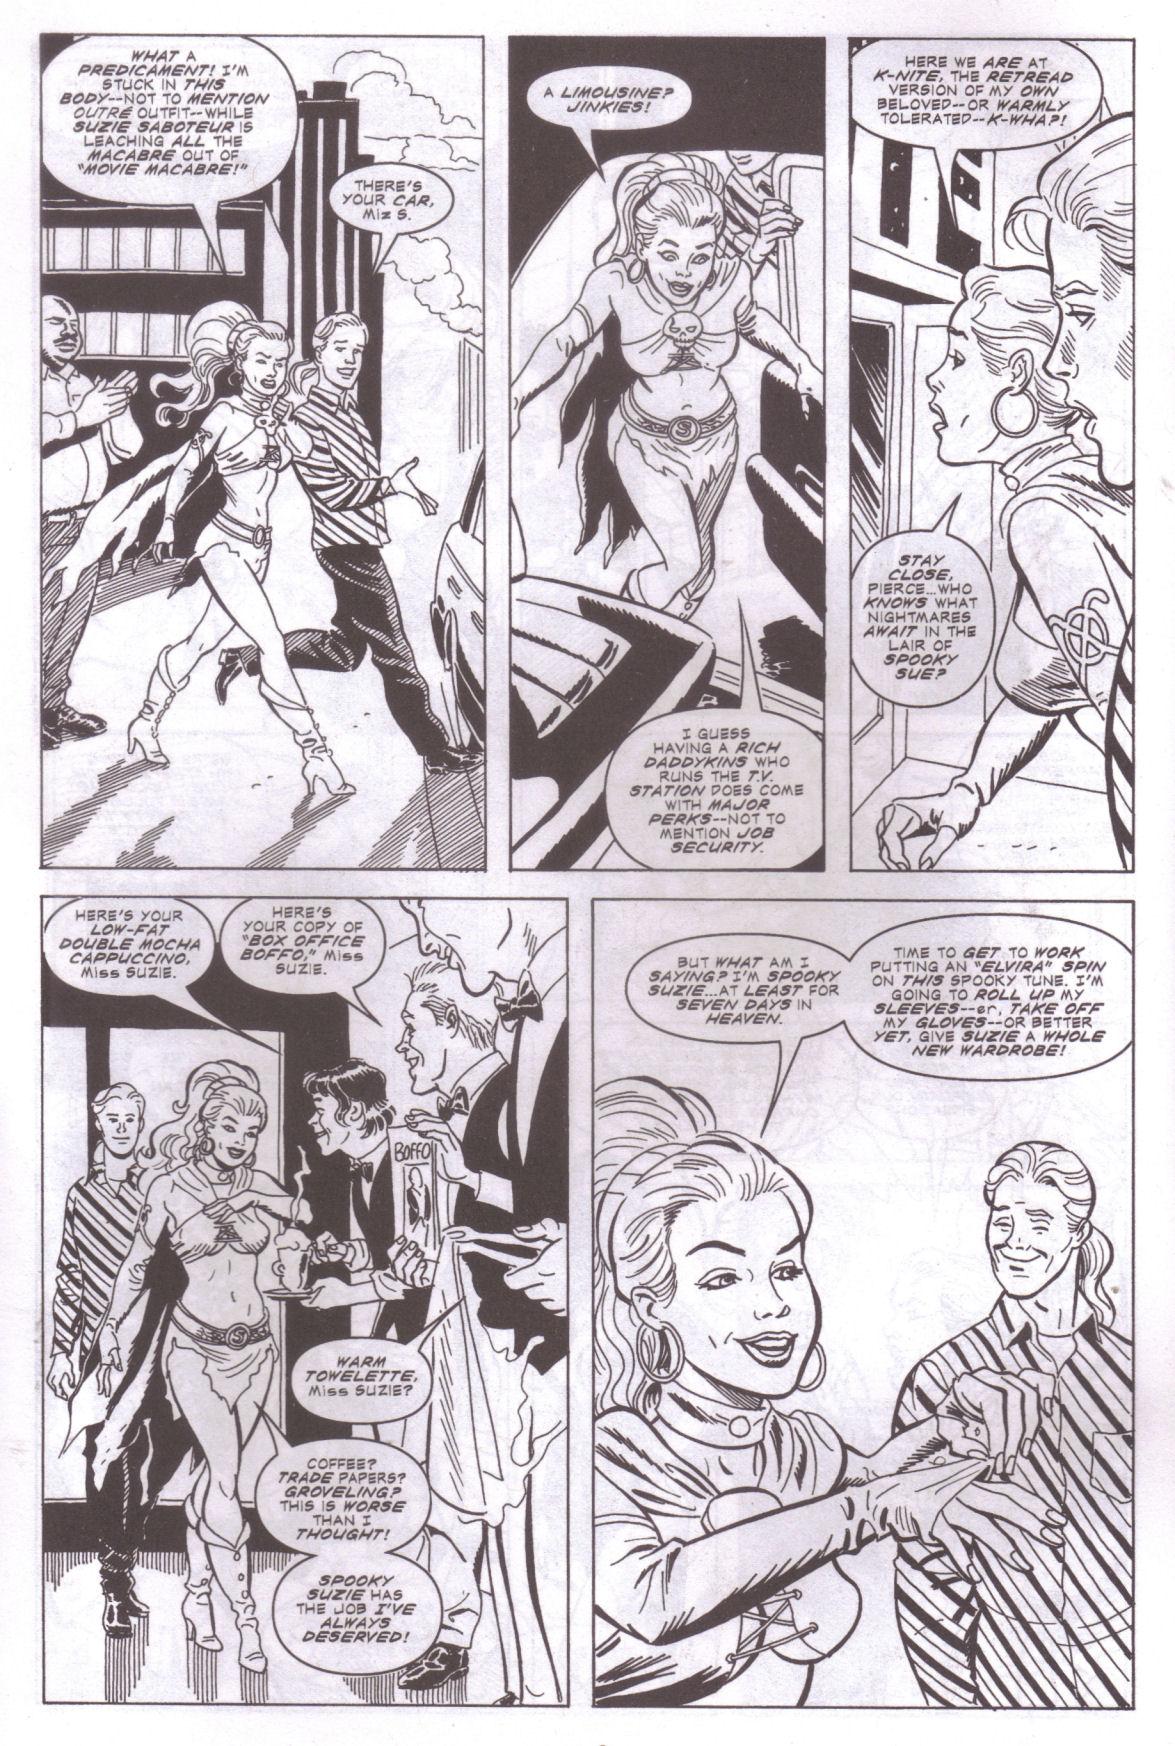 Read online Elvira, Mistress of the Dark comic -  Issue #159 - 10